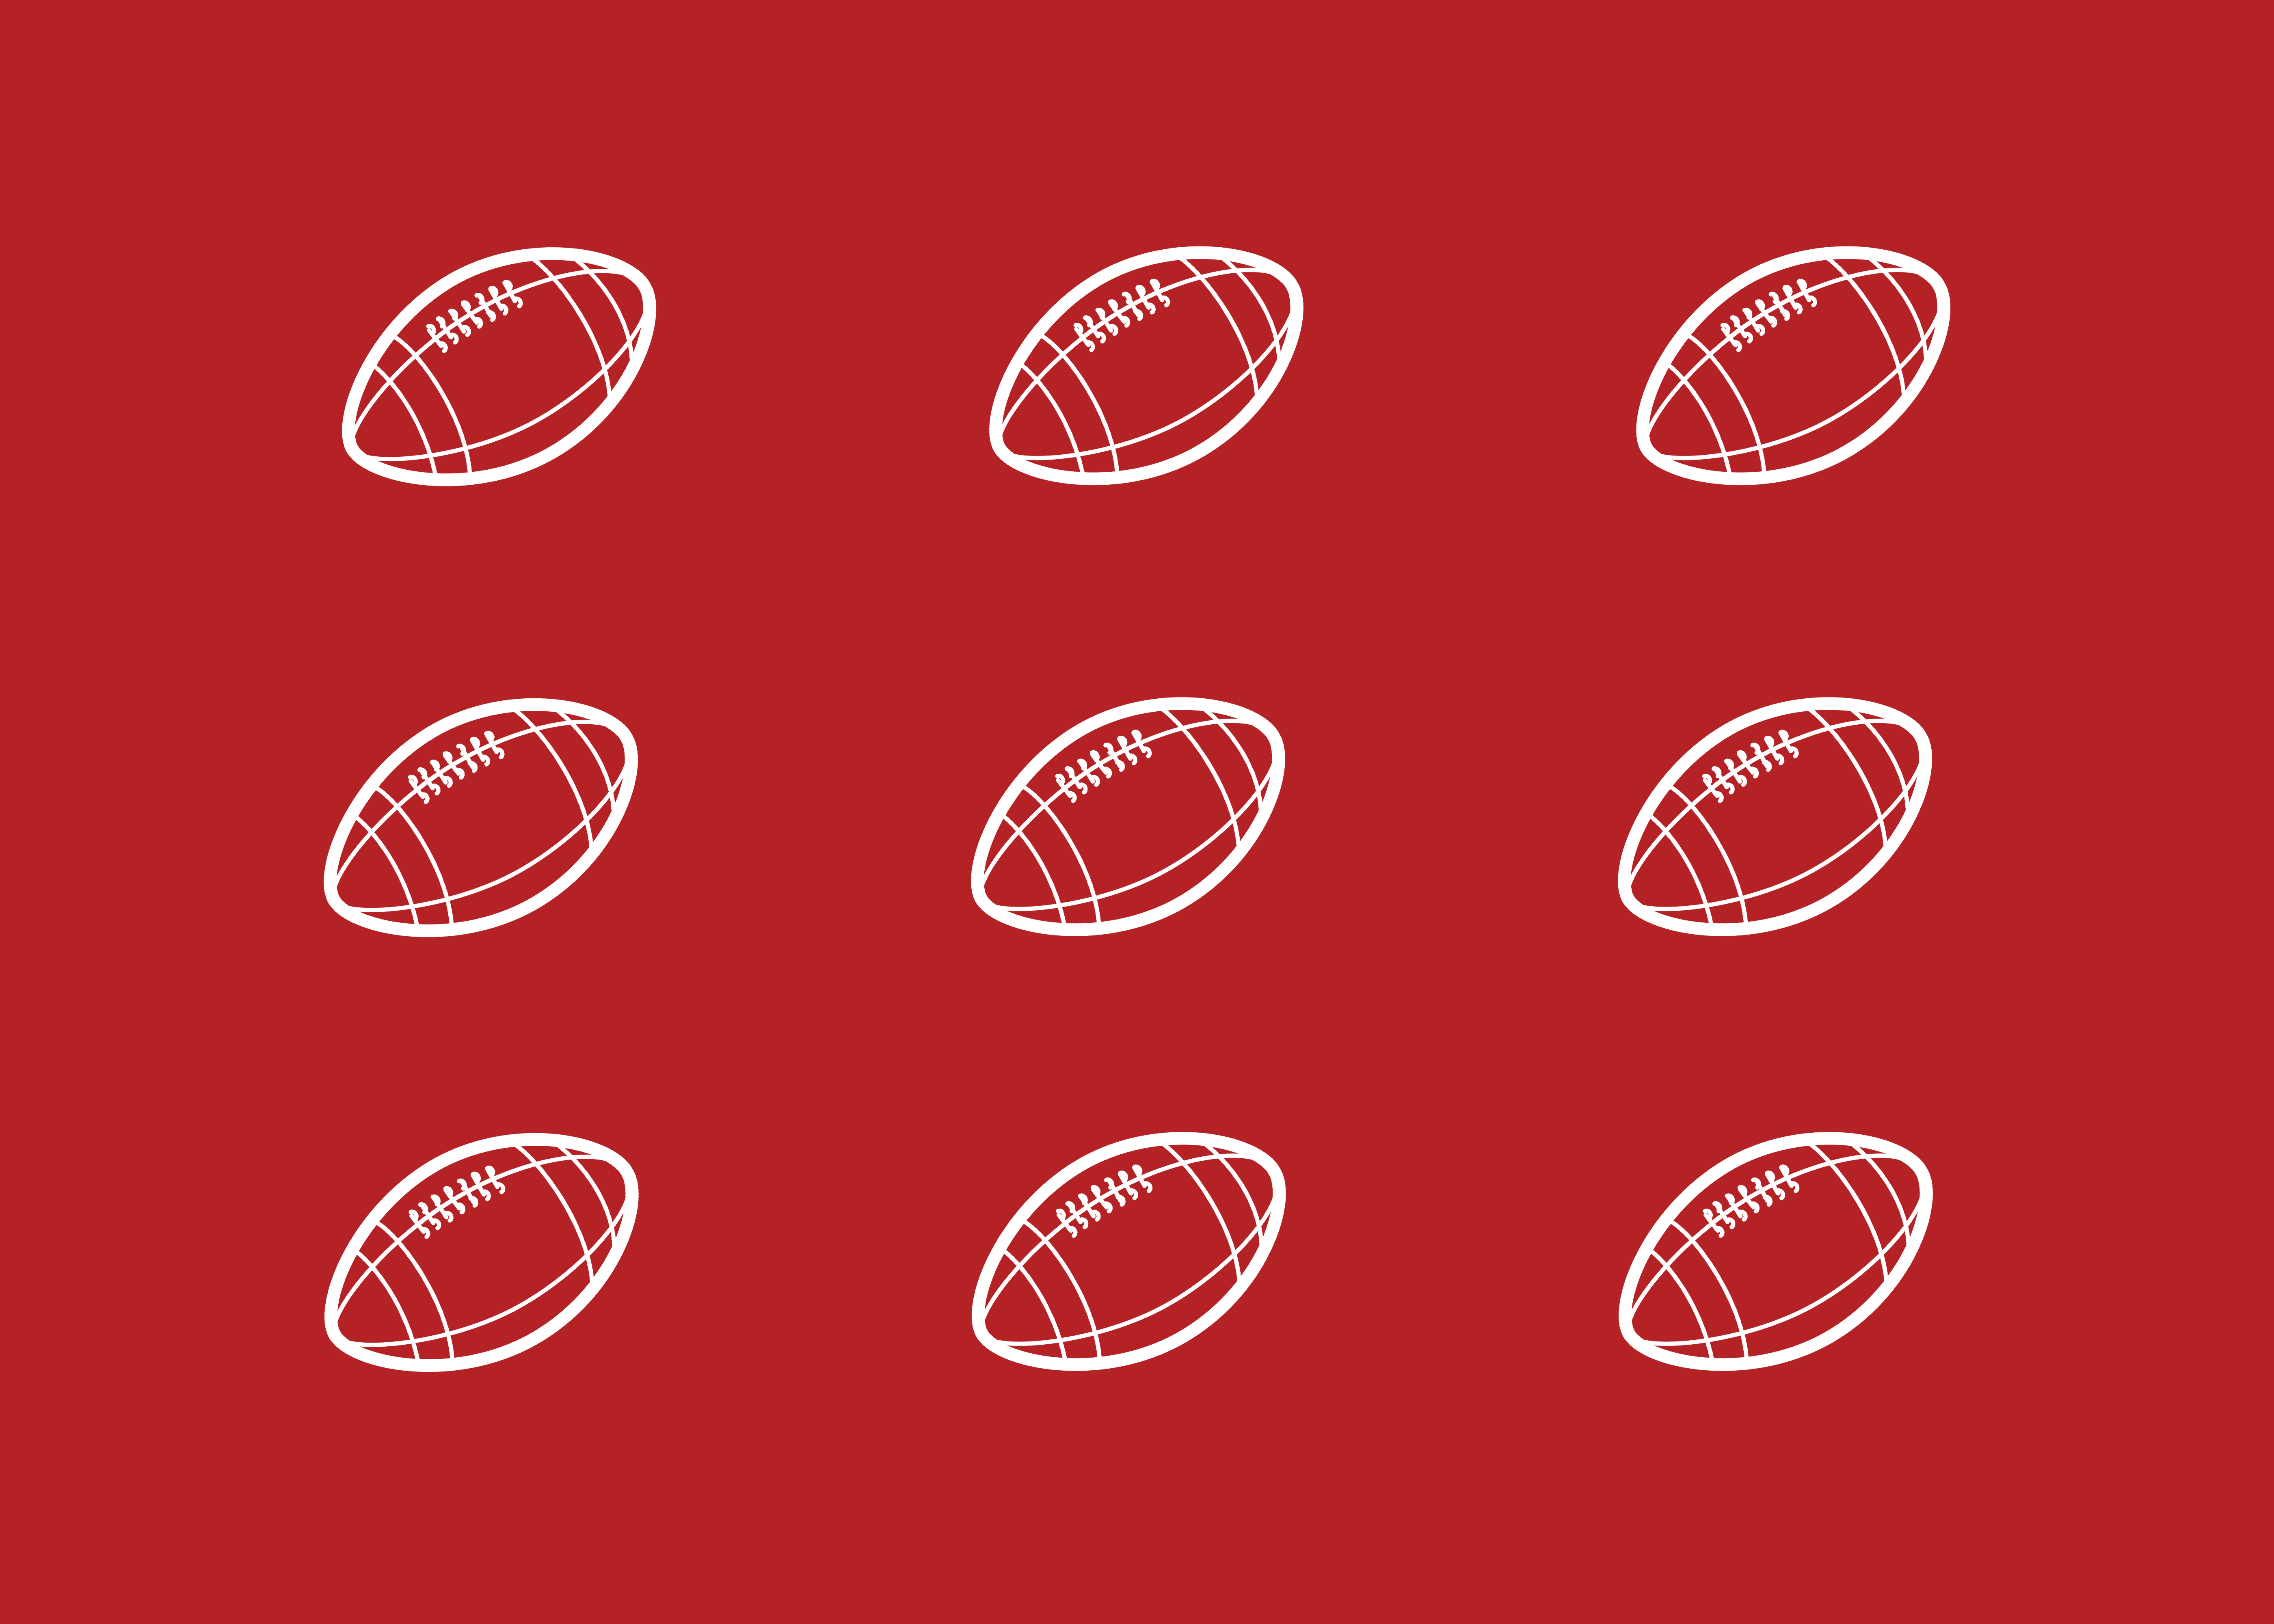 White footballs against red backdrop